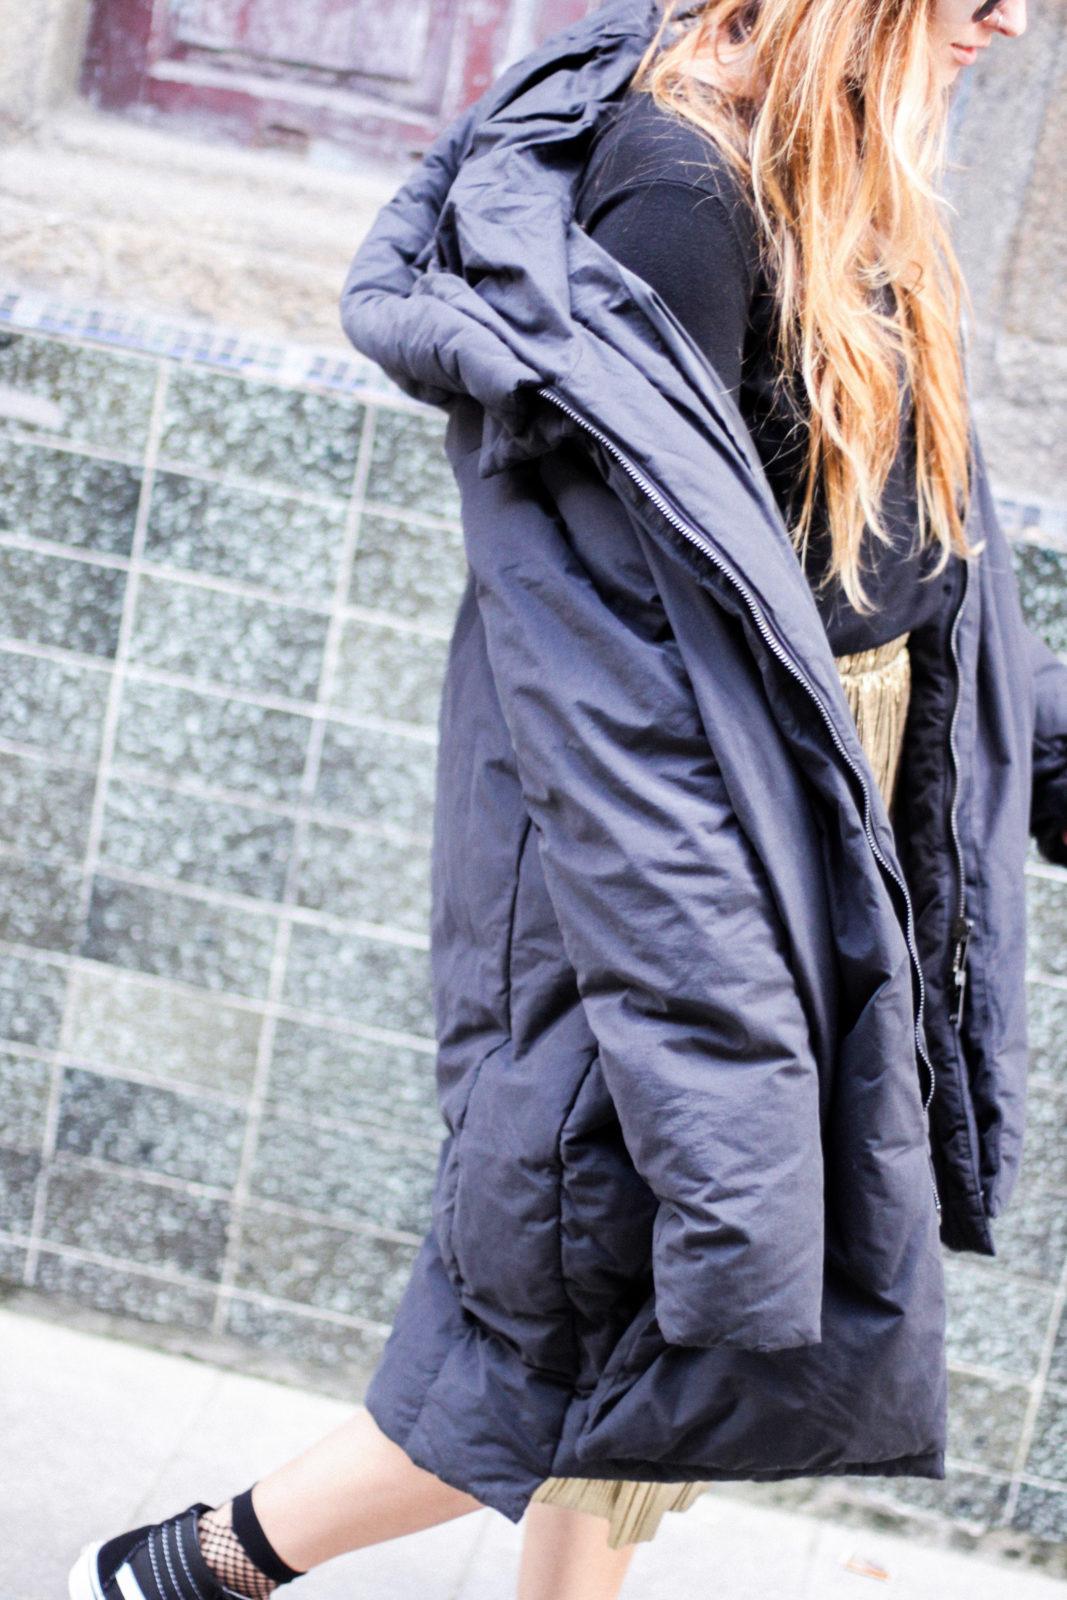 puffer_coat_plumifero_maxi_abrigo_calcetines_rejilla_falda_midi_metalizados_beanie_choker_vans-18